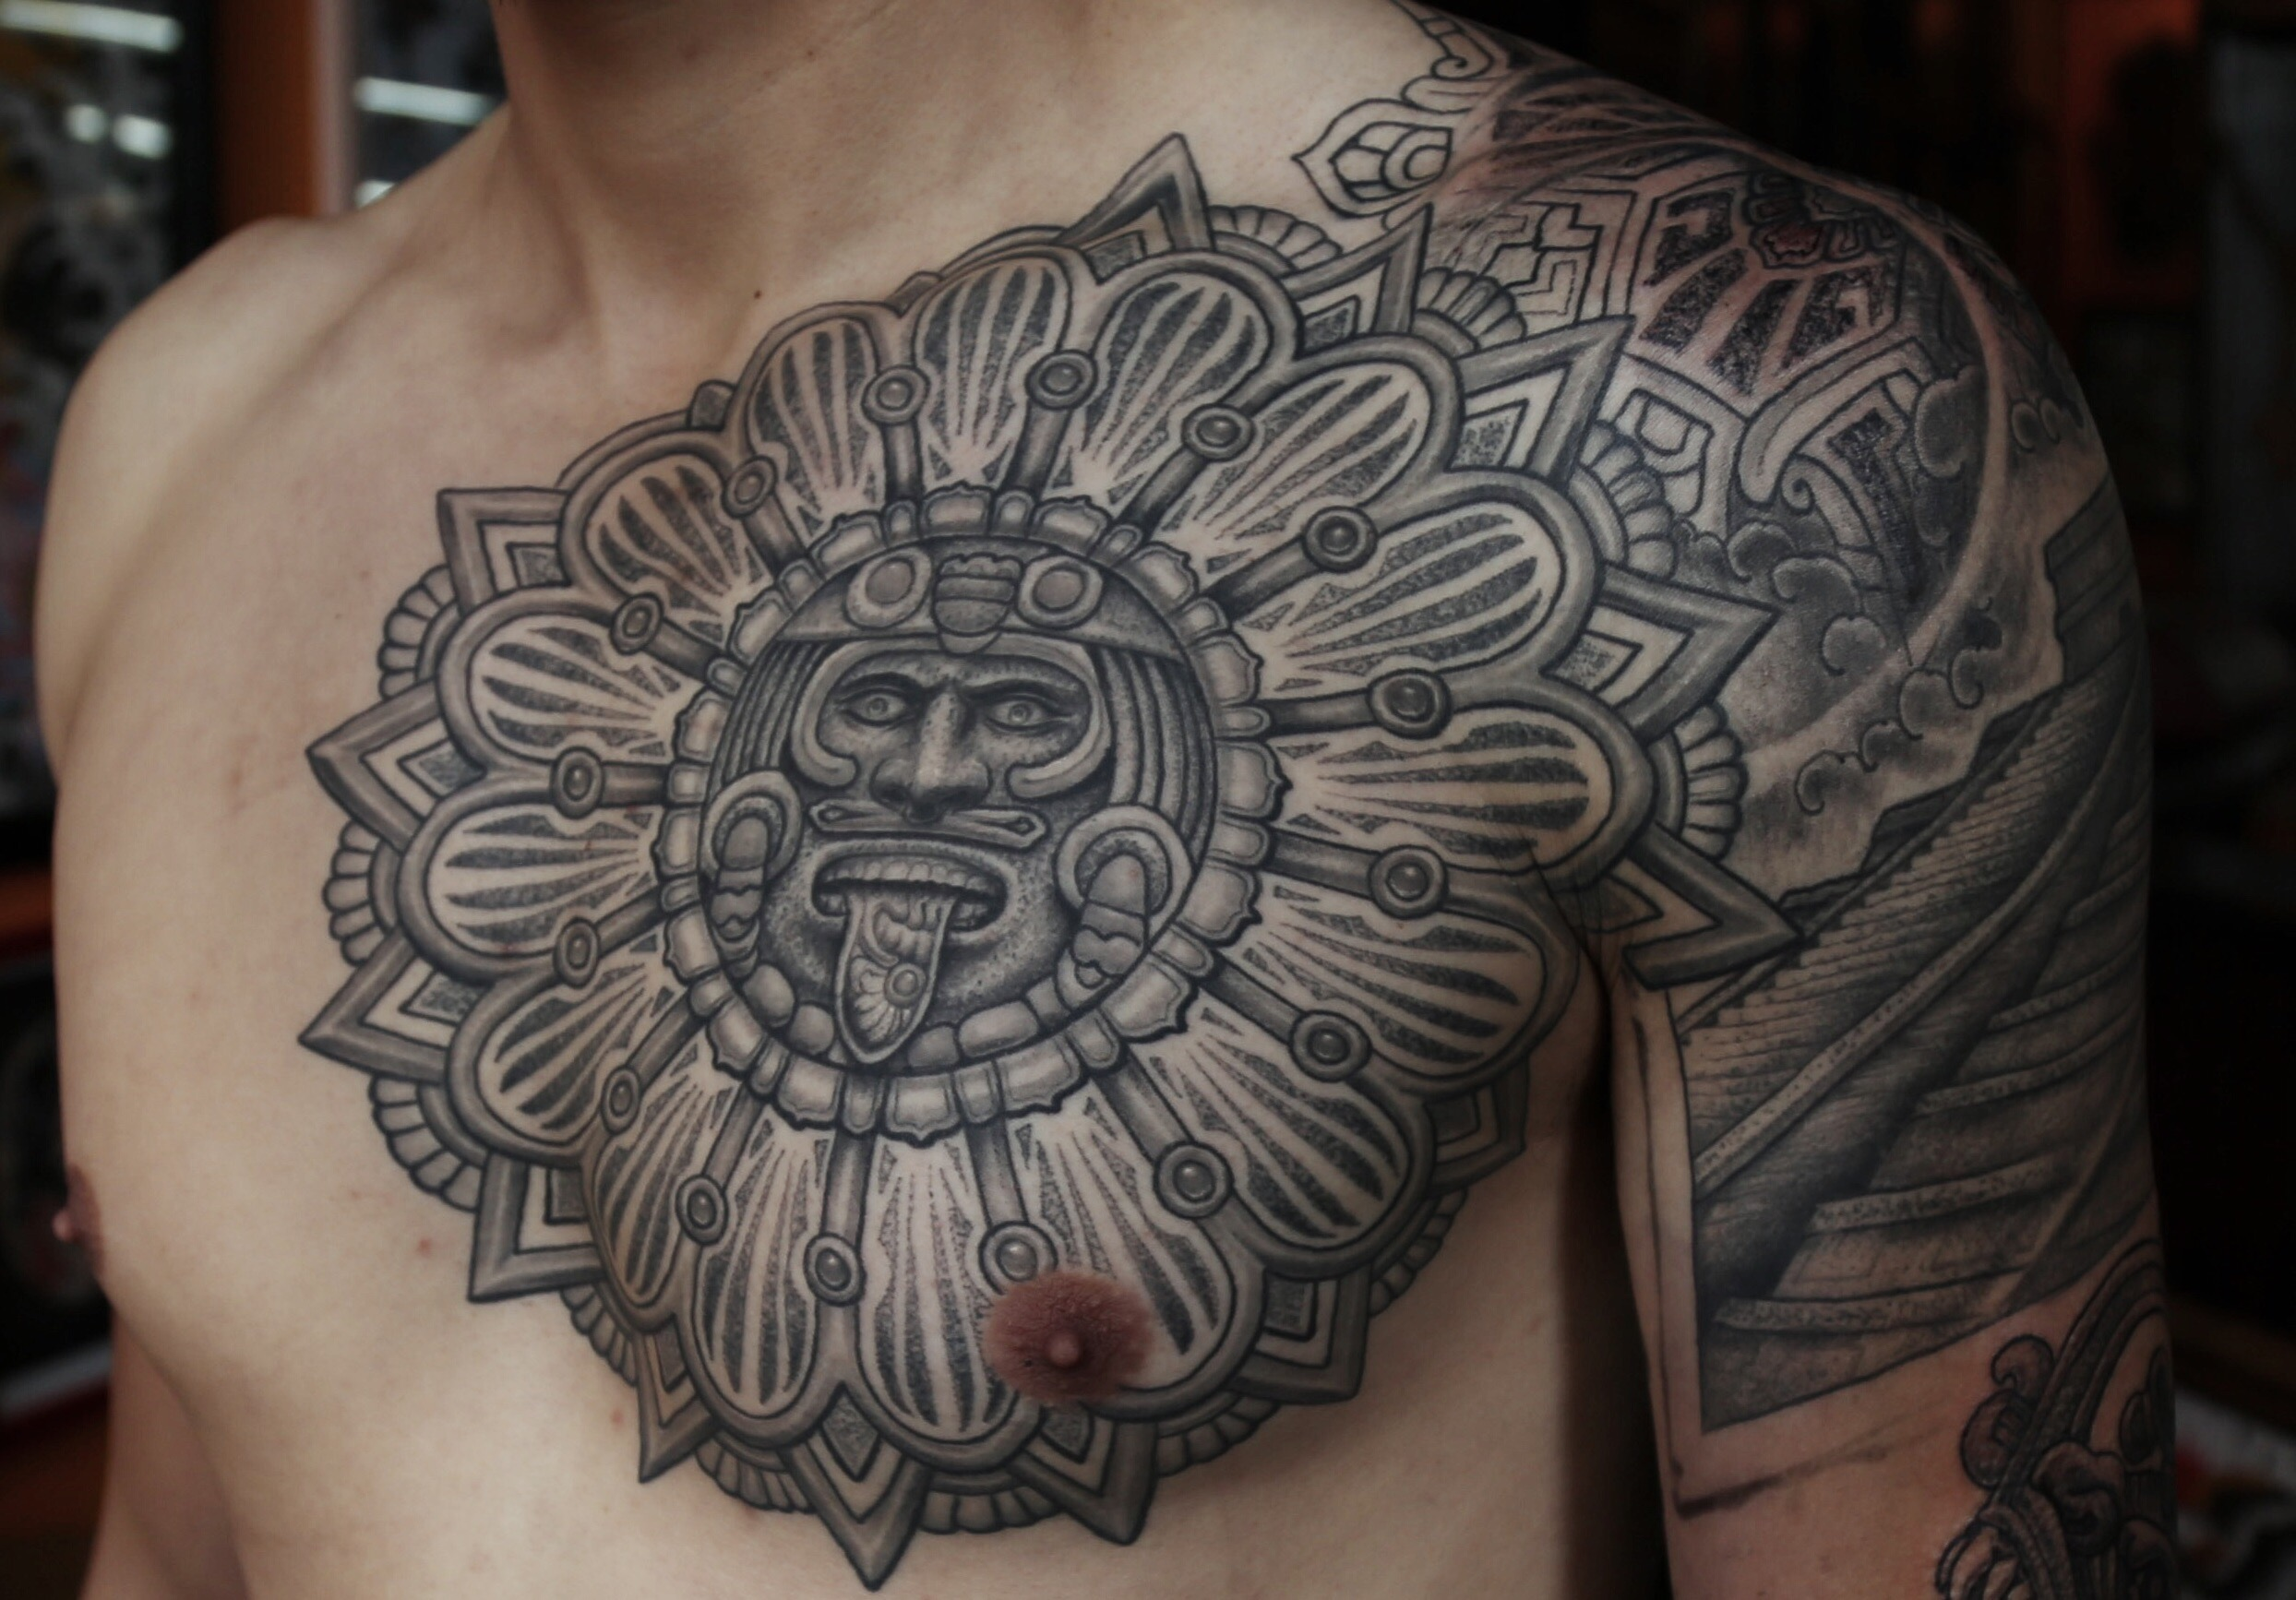 enrique bernal ejay tattoo dallas texas aztek calendar stipple.jpeg